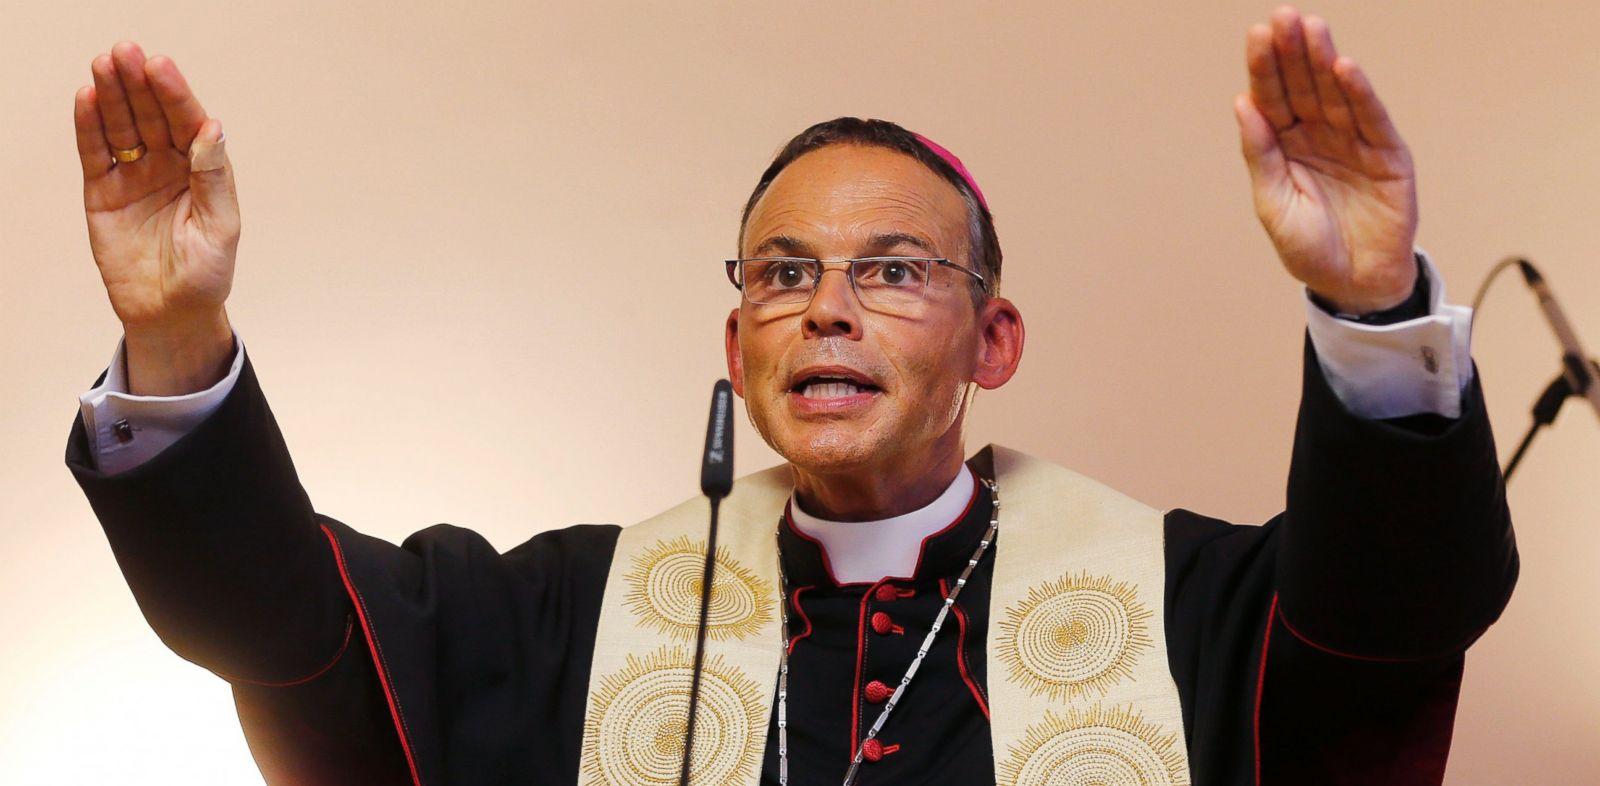 PHOTO: The Bishop of Limburg Franz-Peter Tebartz-van Elst blesses a new Kindergarden in Frankfurt, Germany, Aug. 29, 2013.